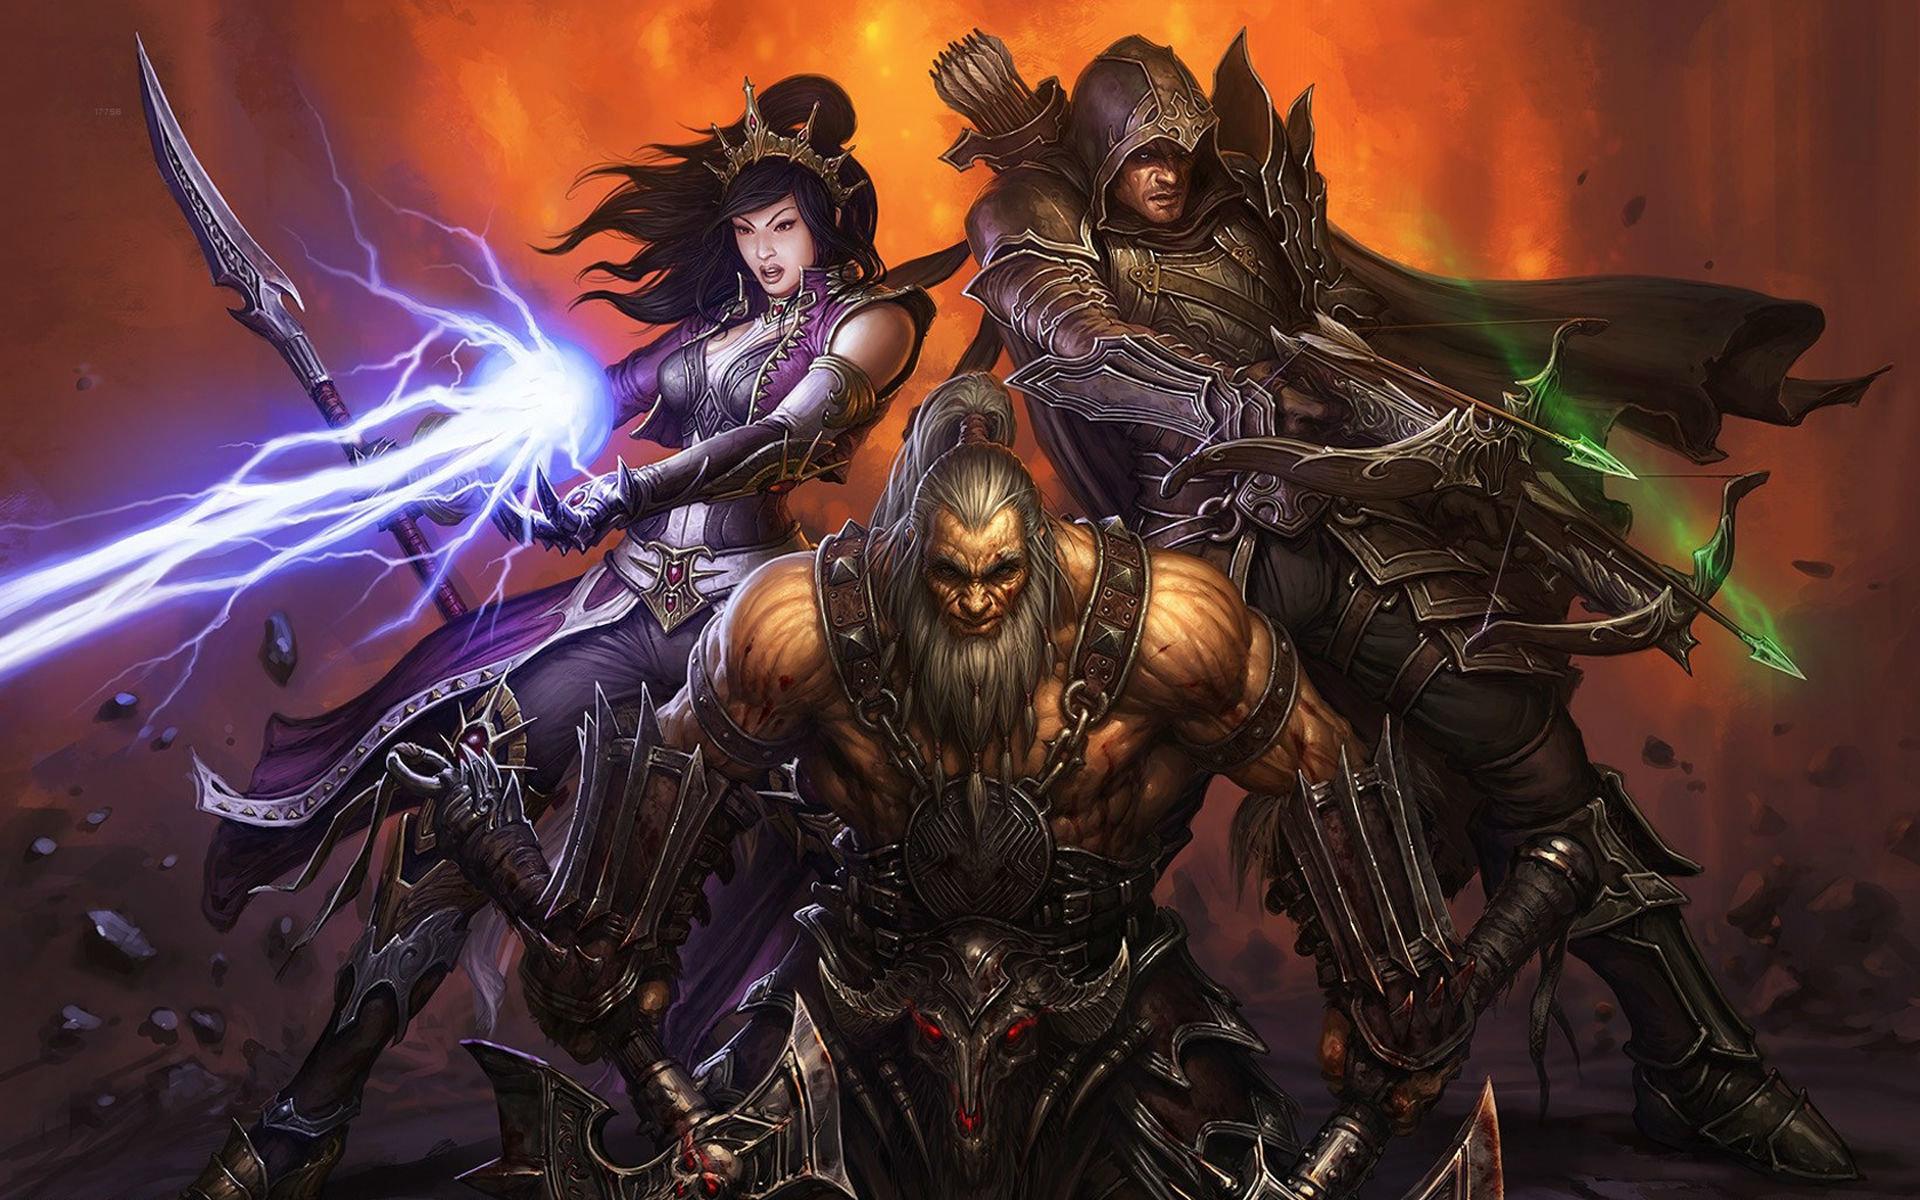 Wizard Diablo 3 Wallpapers Hd For Desktop Backgrounds